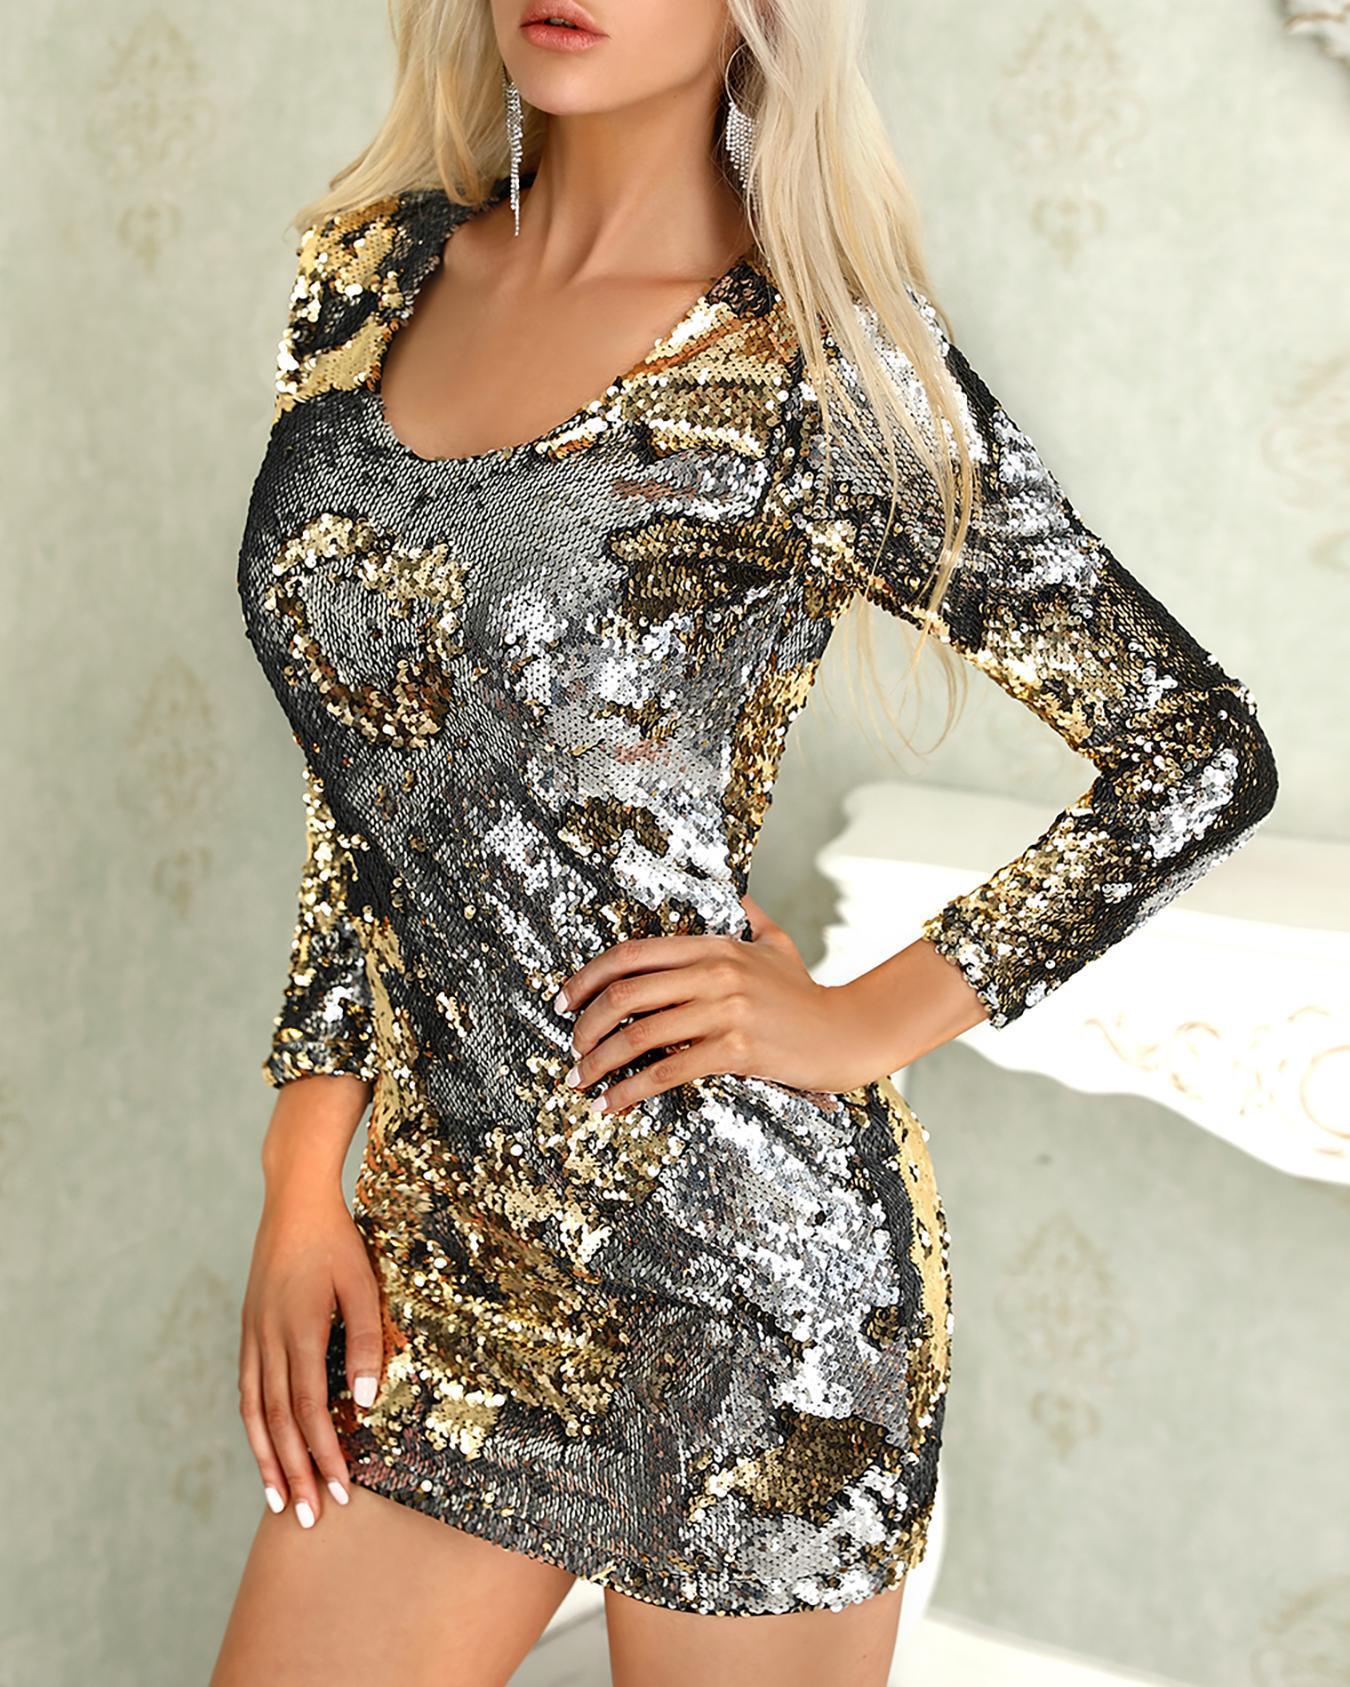 boutiquefeel / Vestido de fiesta de lentejuelas sin respaldo de manga larga